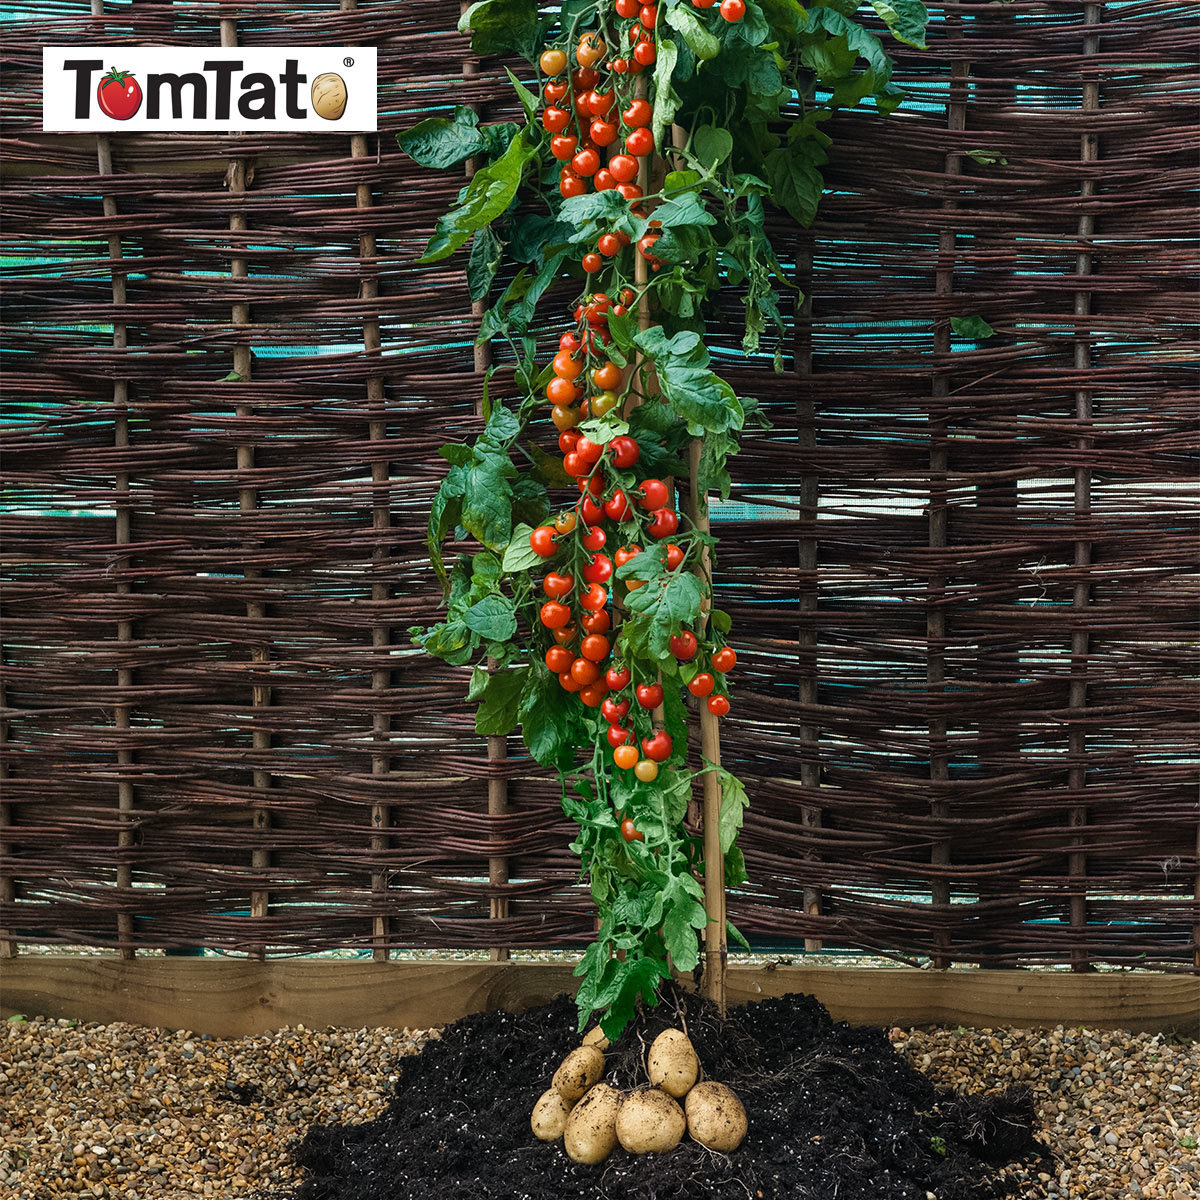 Tomaten-Kartoffelpflanze TomTato, veredelt